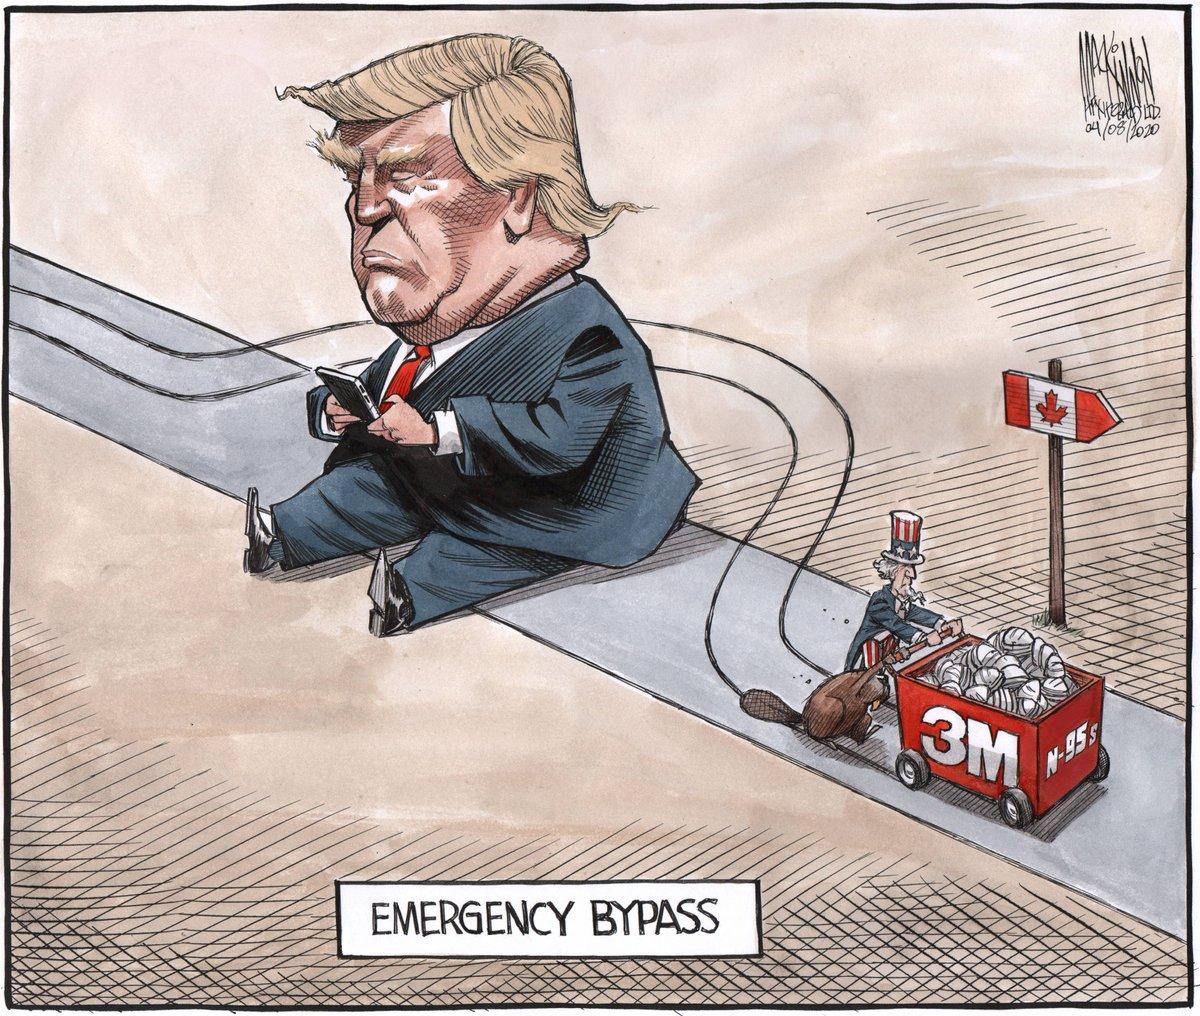 Bruce MacKinnon's new Political cartoon is dead on.  #Canada @CH_Cartoonpic.twitter.com/ydjJC5MuMO